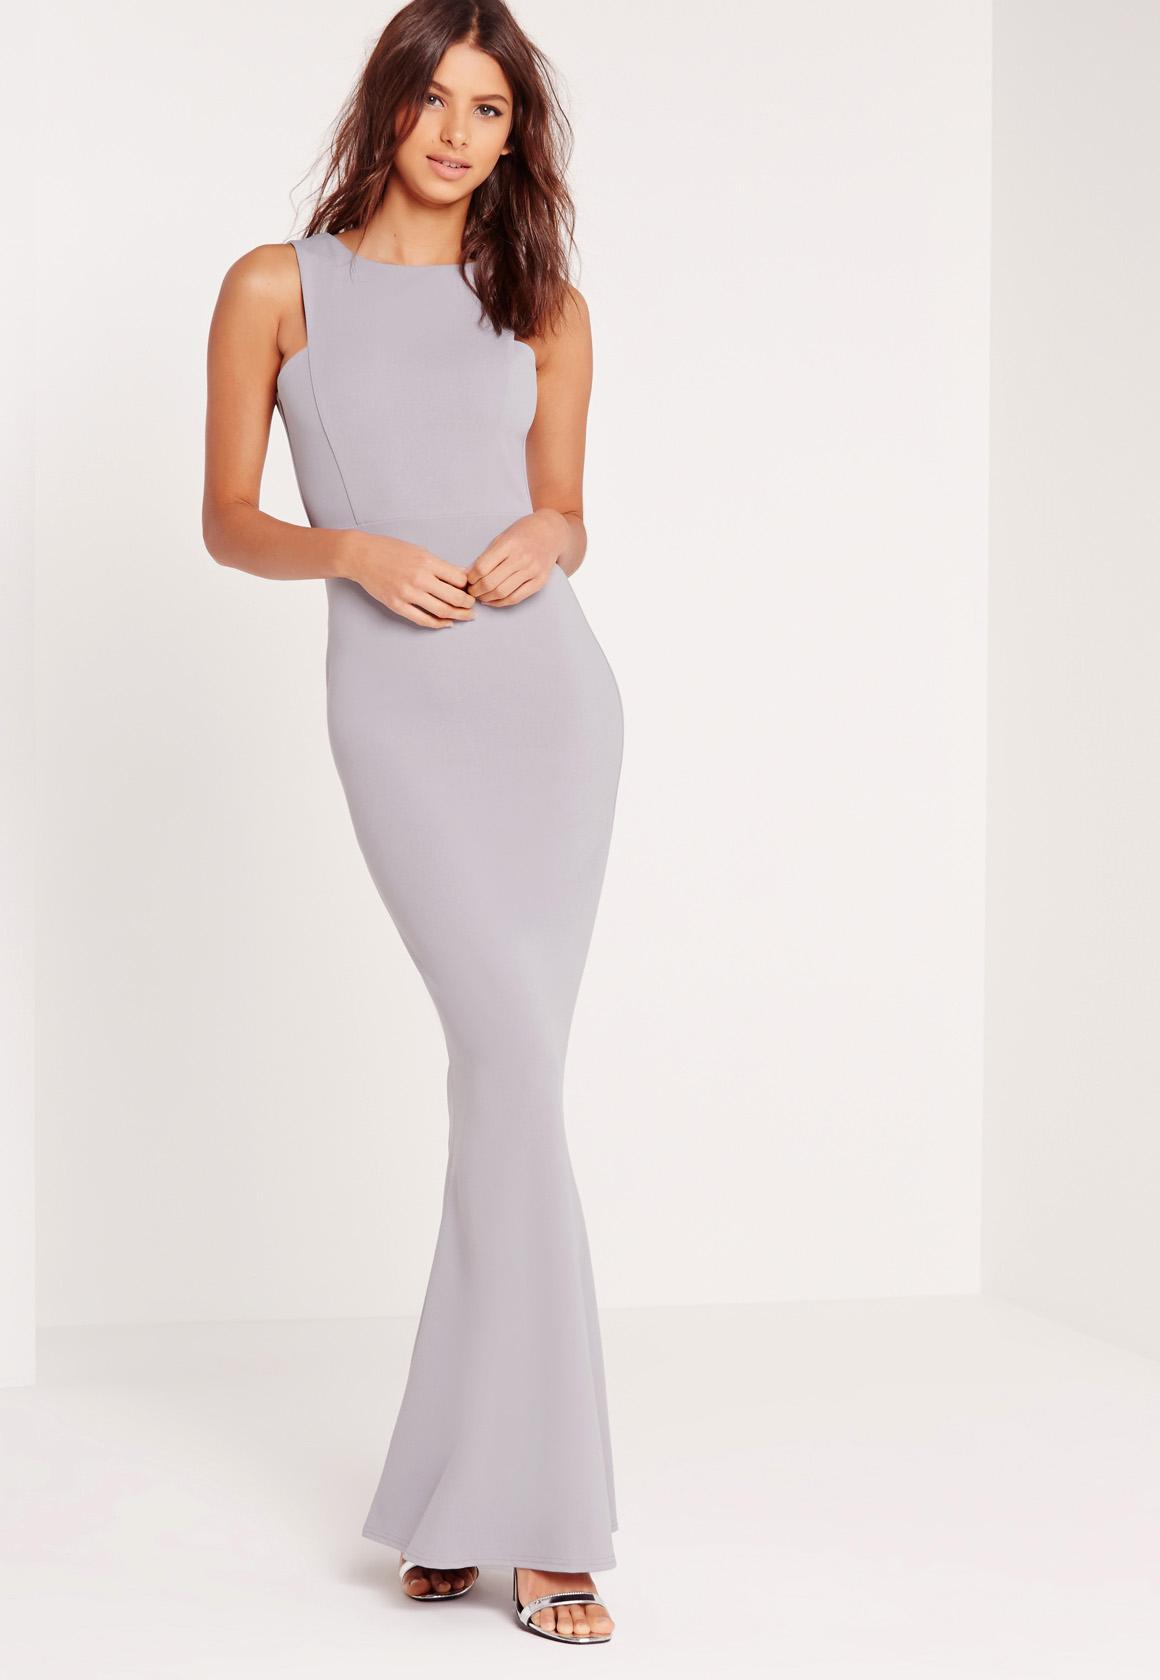 Low Back Maxi Dress Grey